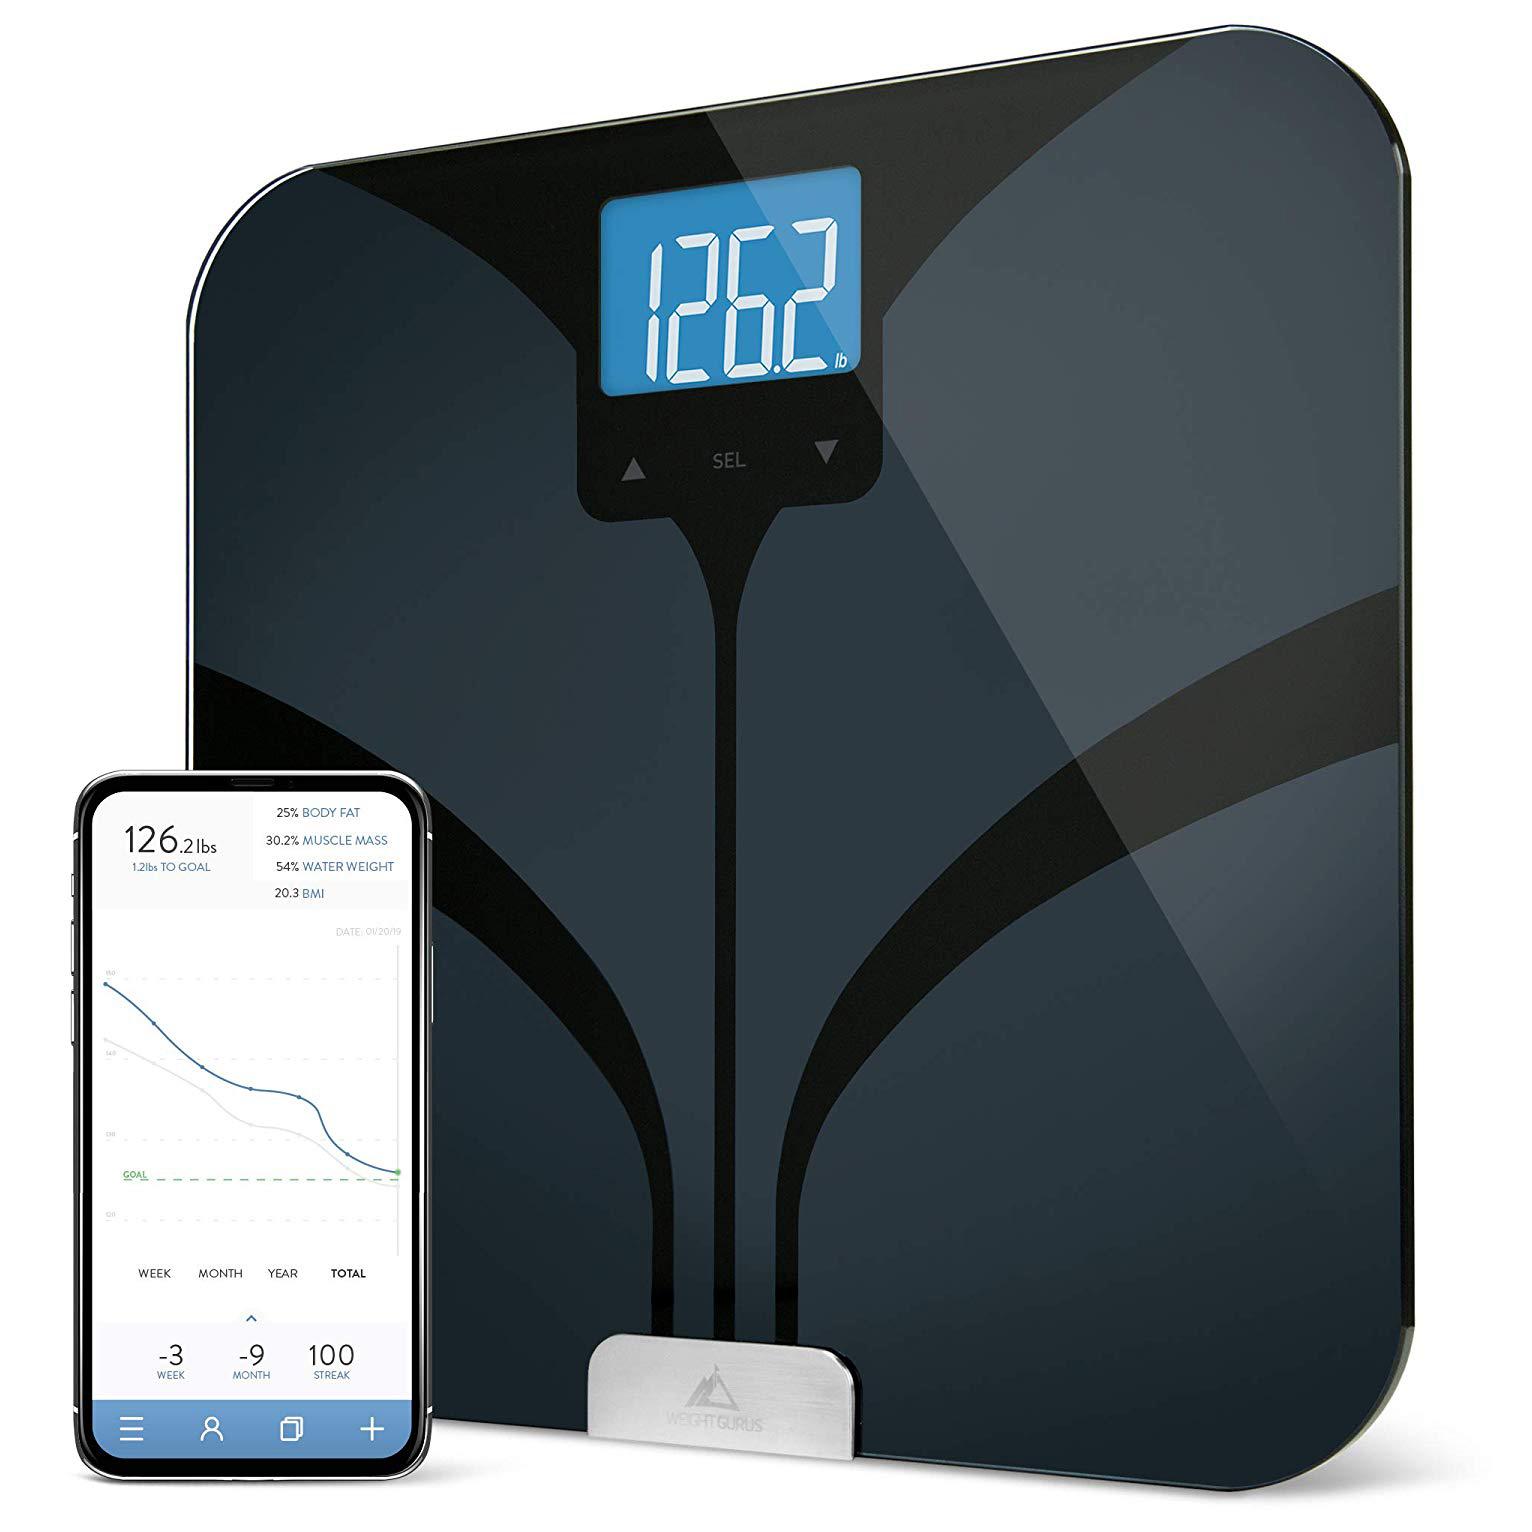 WEIGHT GURUS BLUETOOTH SMART SCALE | Best Value: Smart Scale Under $50